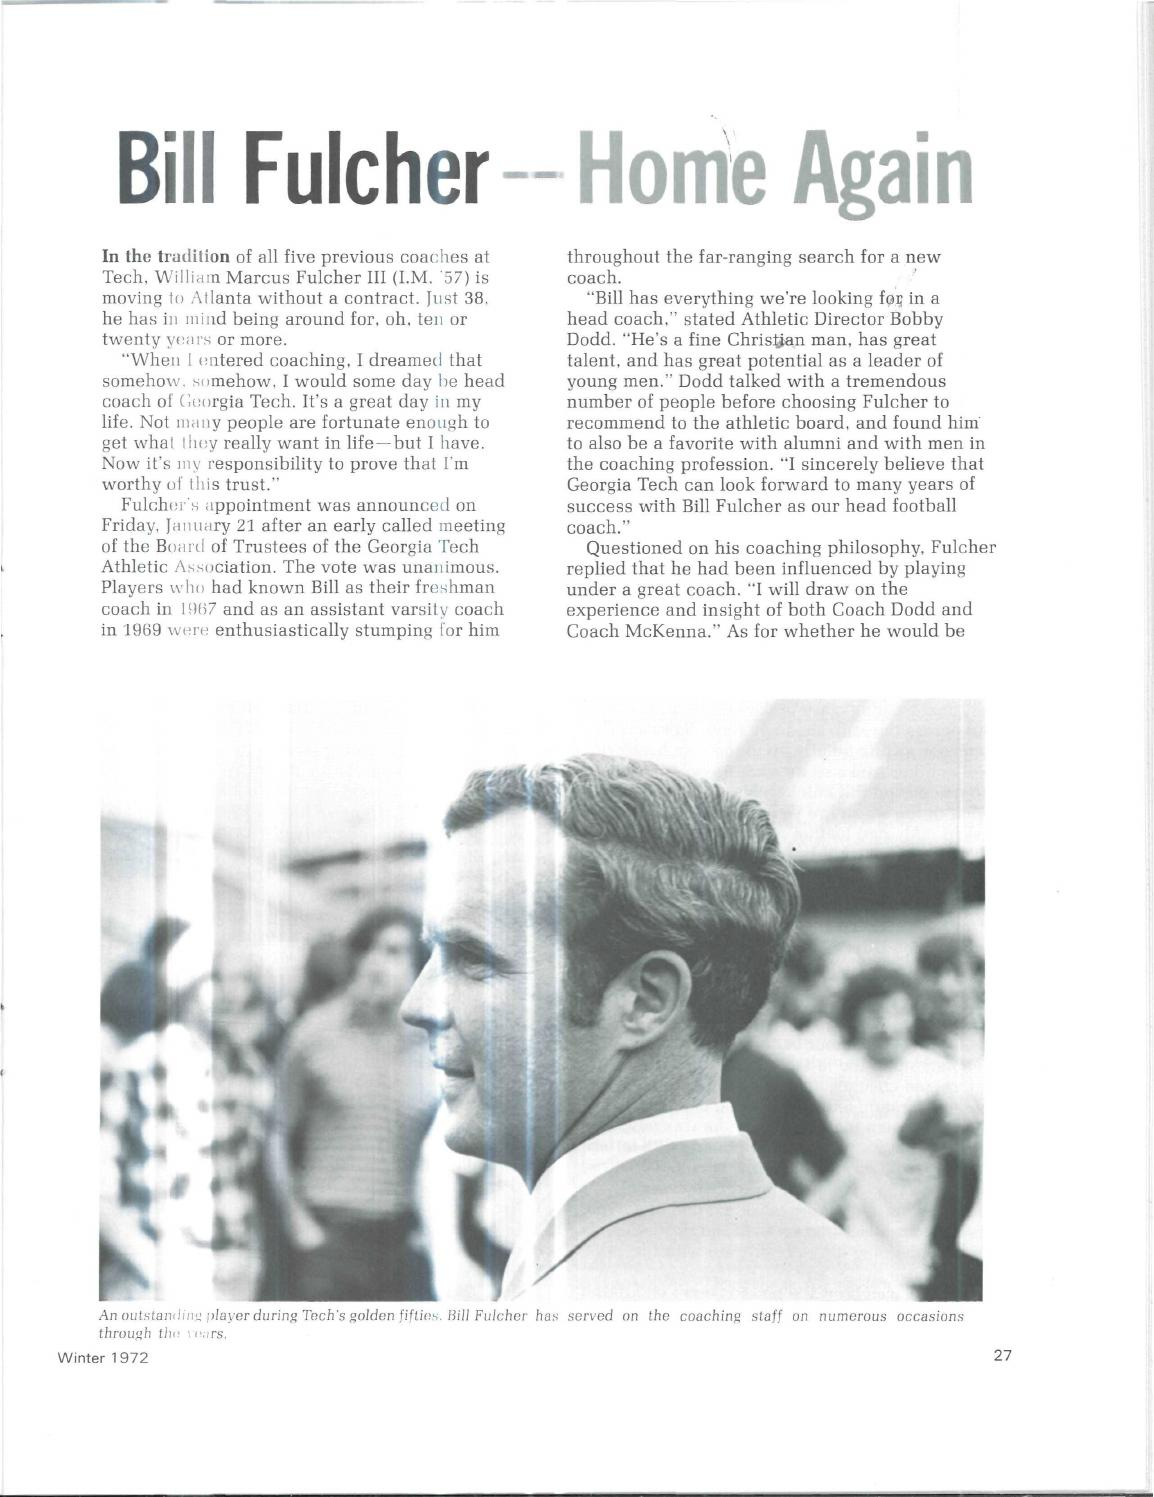 Georgia Tech Alumni Magazine Vol. 50, No. 02 1972 by Georgia Tech Alumni  Association - issuu